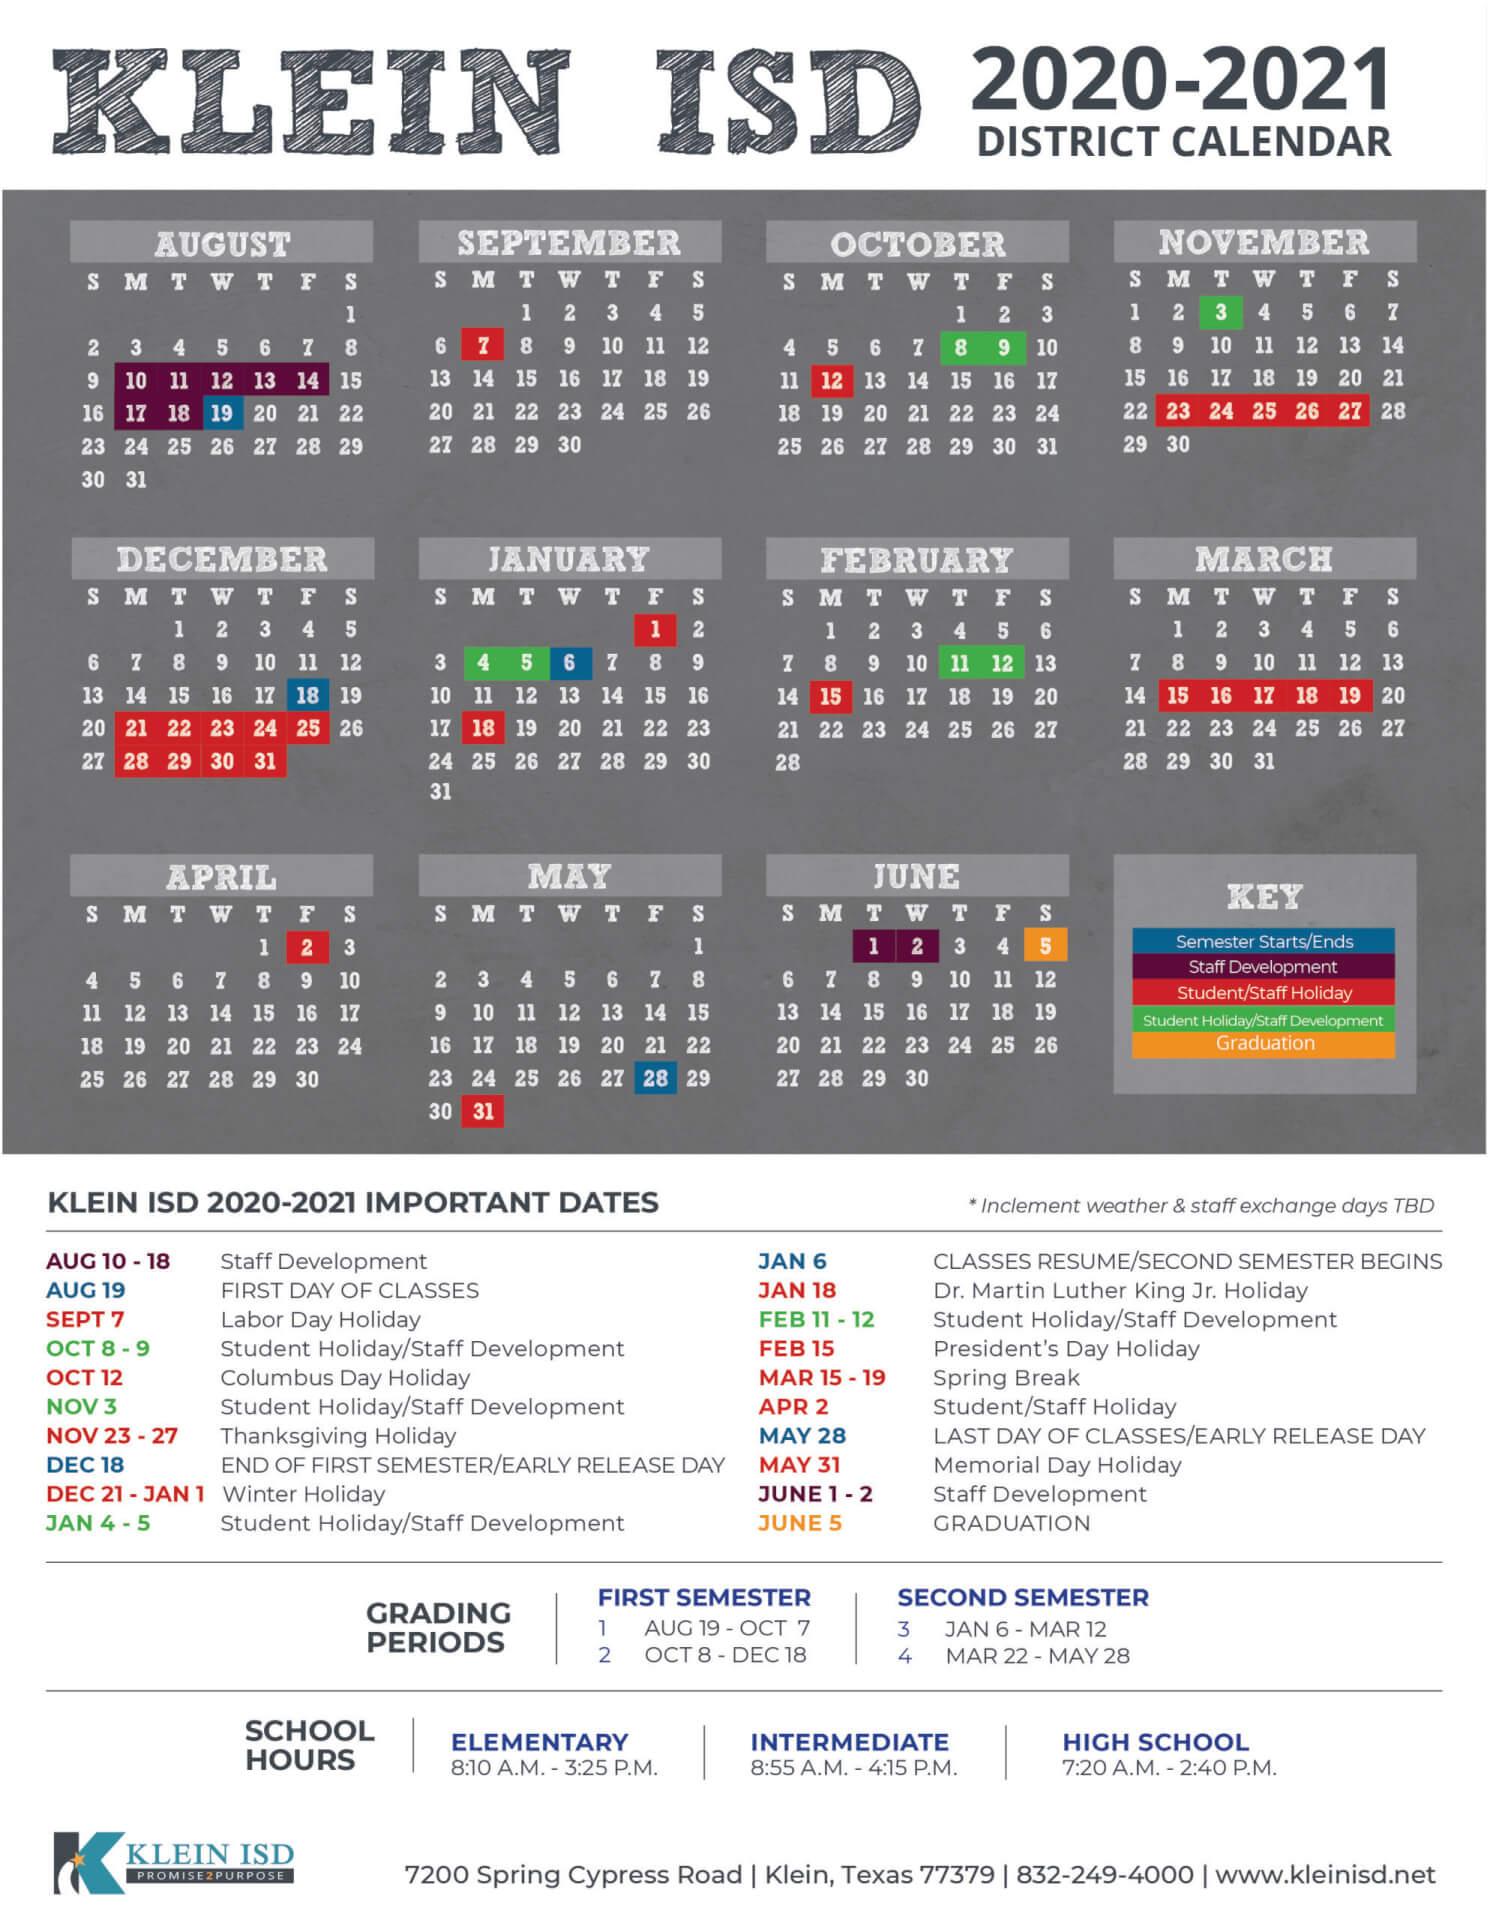 Klein Isd Announces Calendar For 2020 2021 School Year In New Caney School Calendar